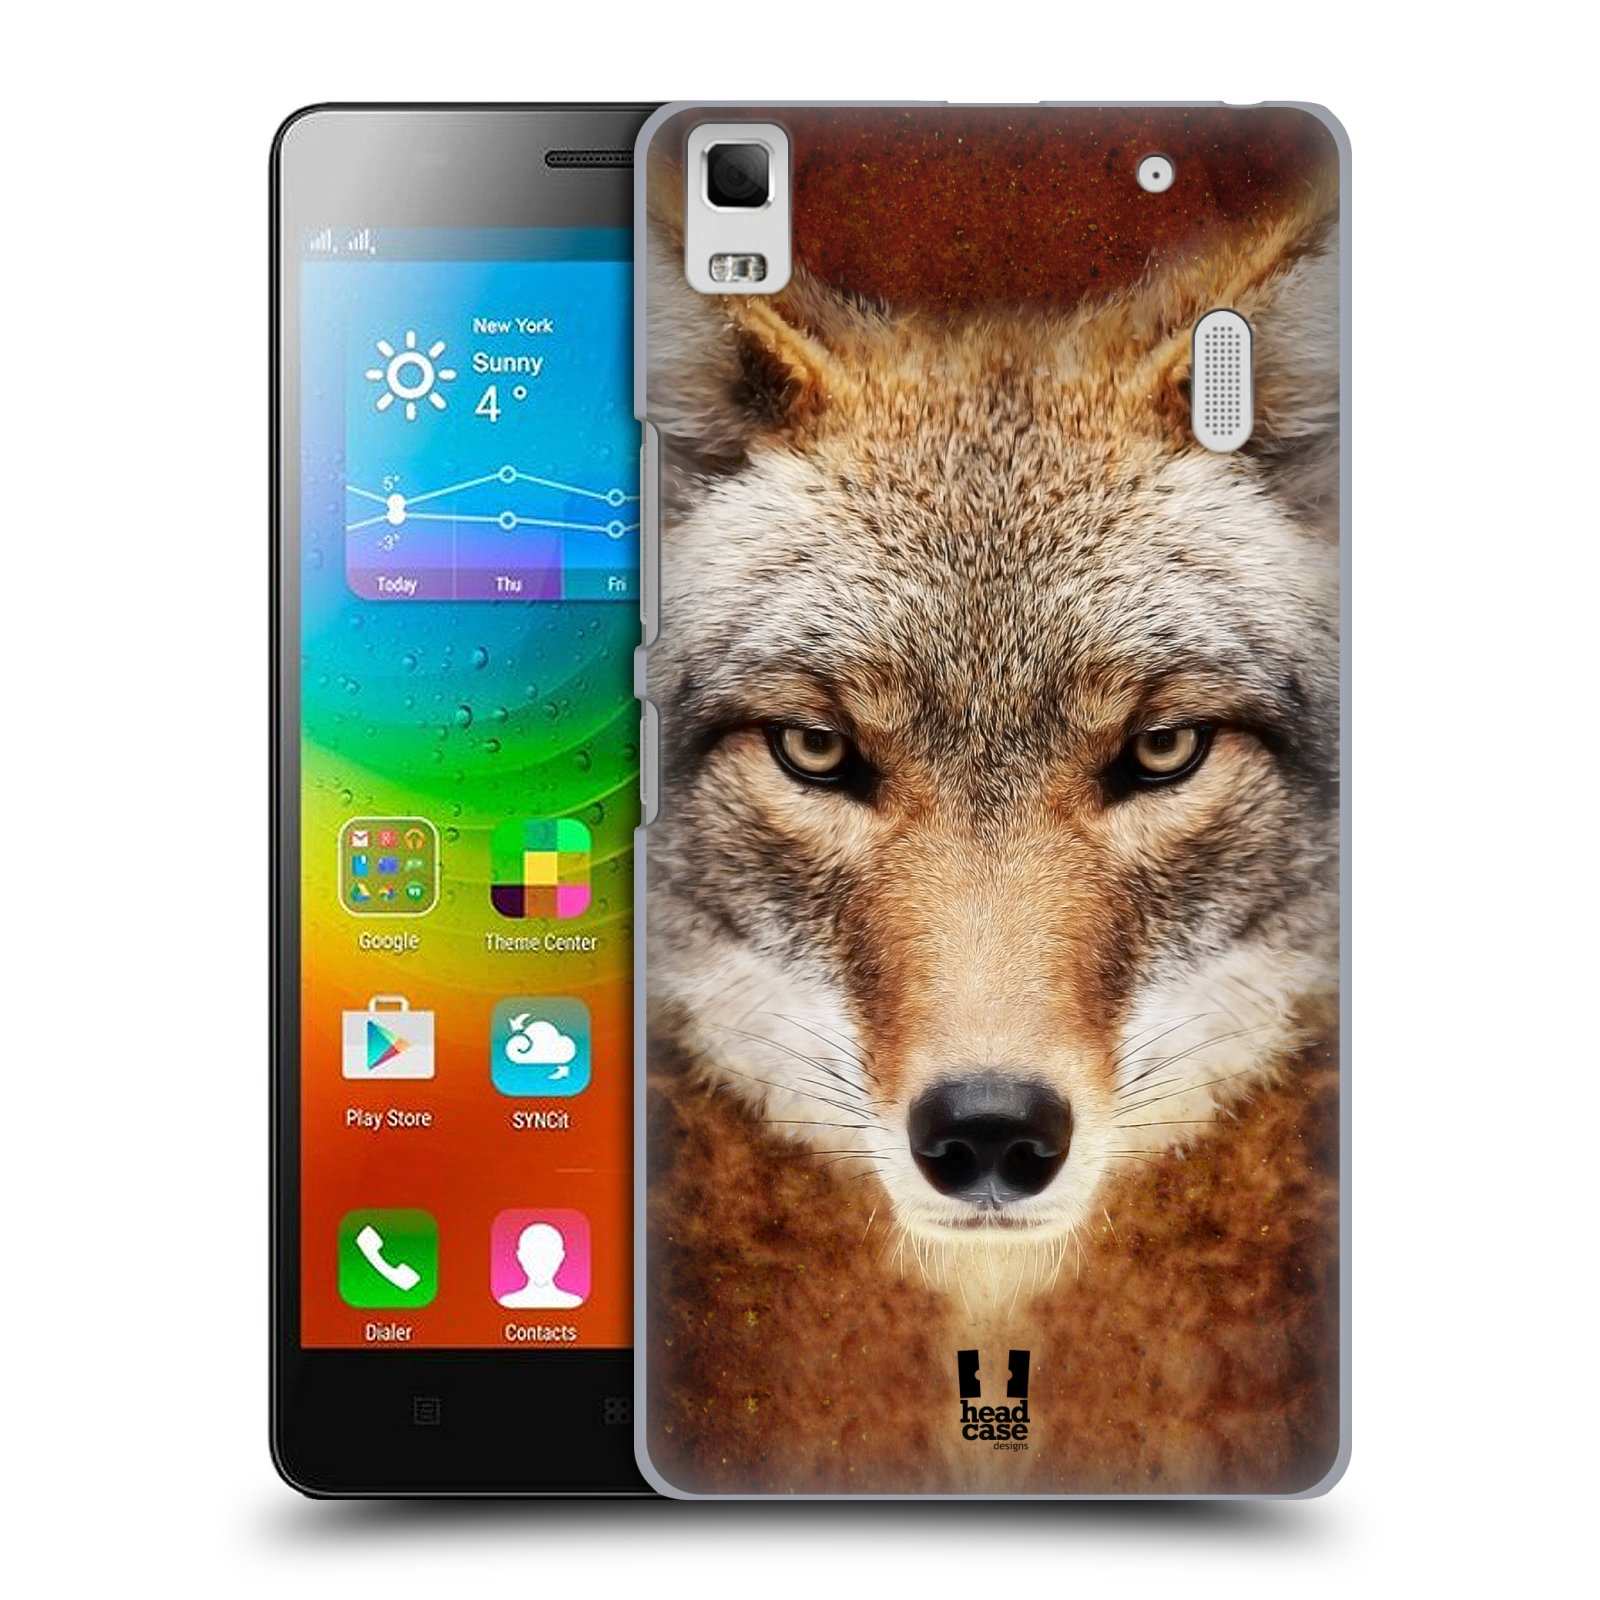 HEAD CASE pevný plastový obal na mobil LENOVO A7000 / A7000 DUAL / K3 NOTE vzor Zvířecí tváře kojot